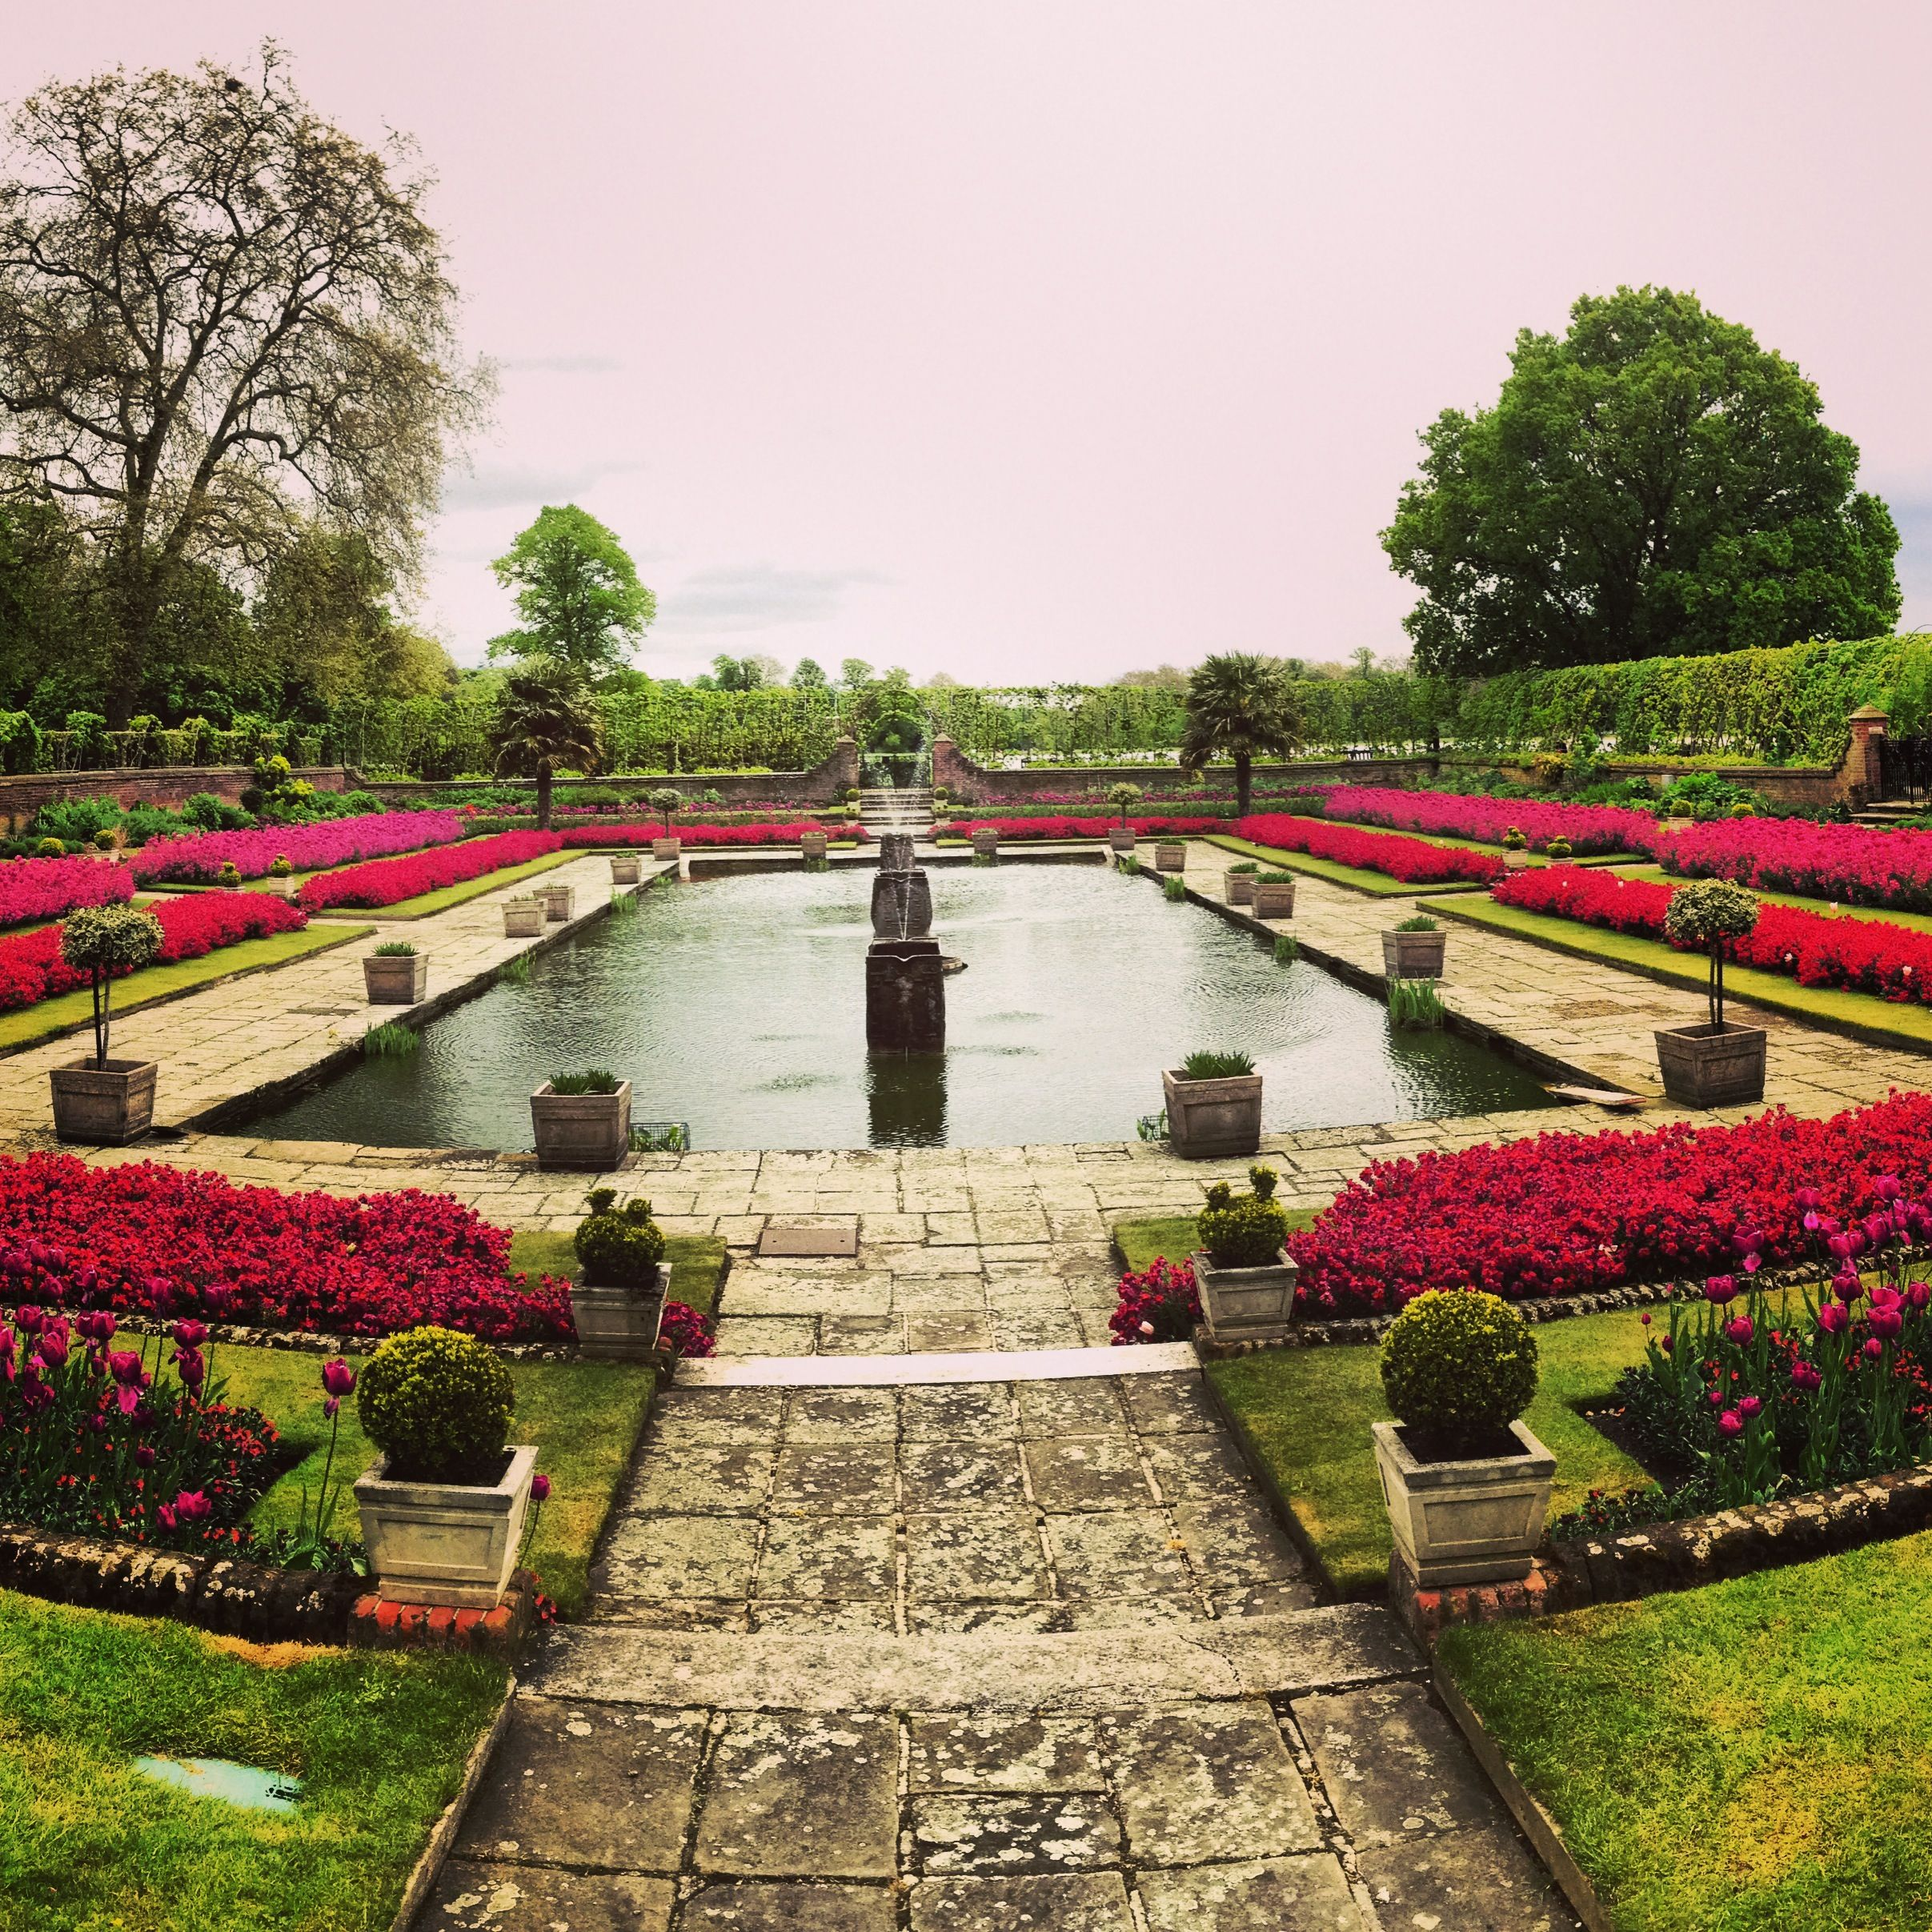 Physic garden wikipedia - Kensington Gardens London